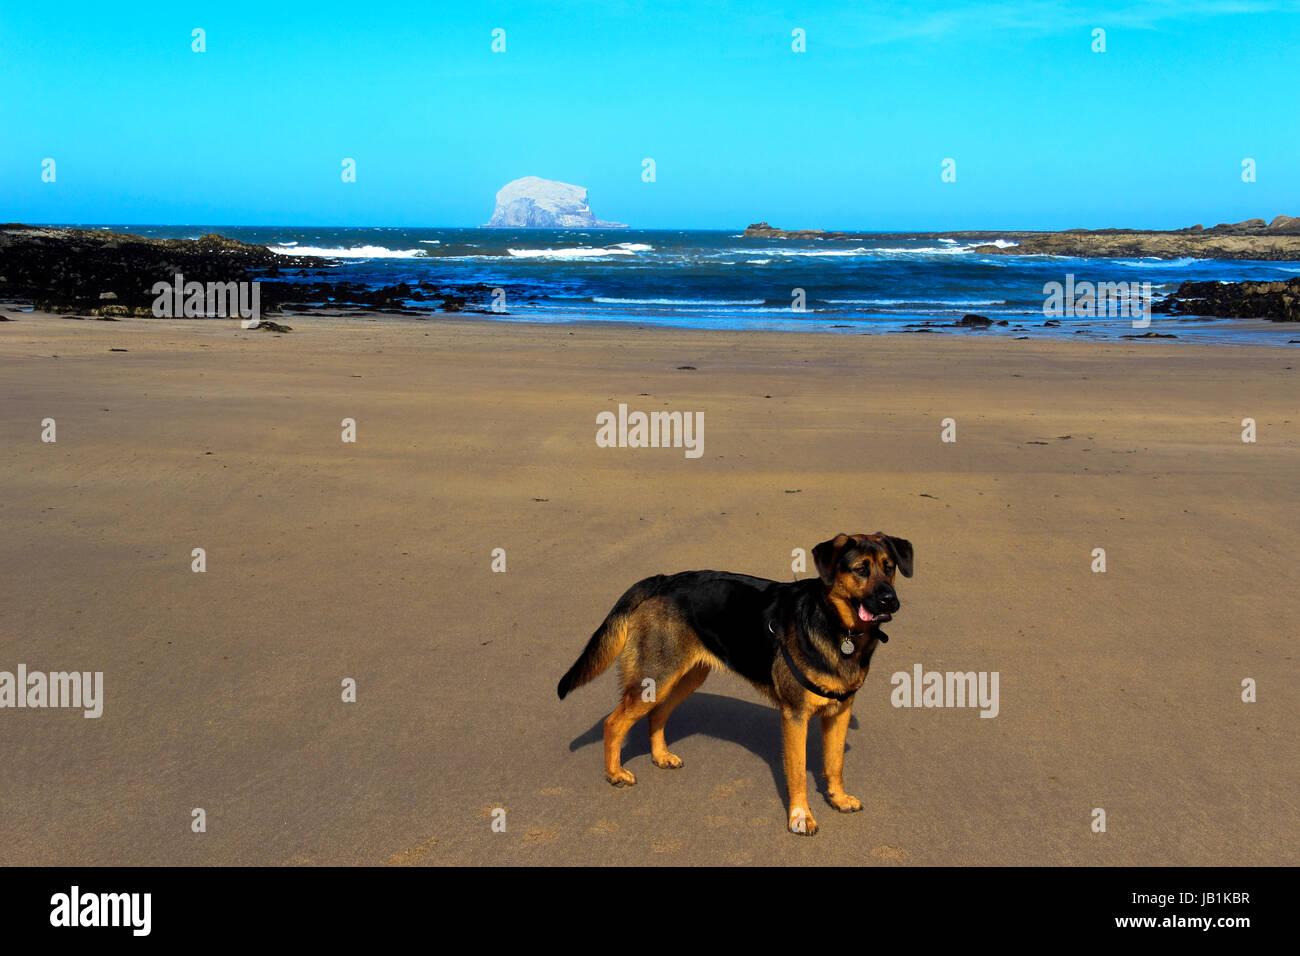 Dog on a beach, Bass Rock, taken from North Berwick, Scotland, UK Stock Photo